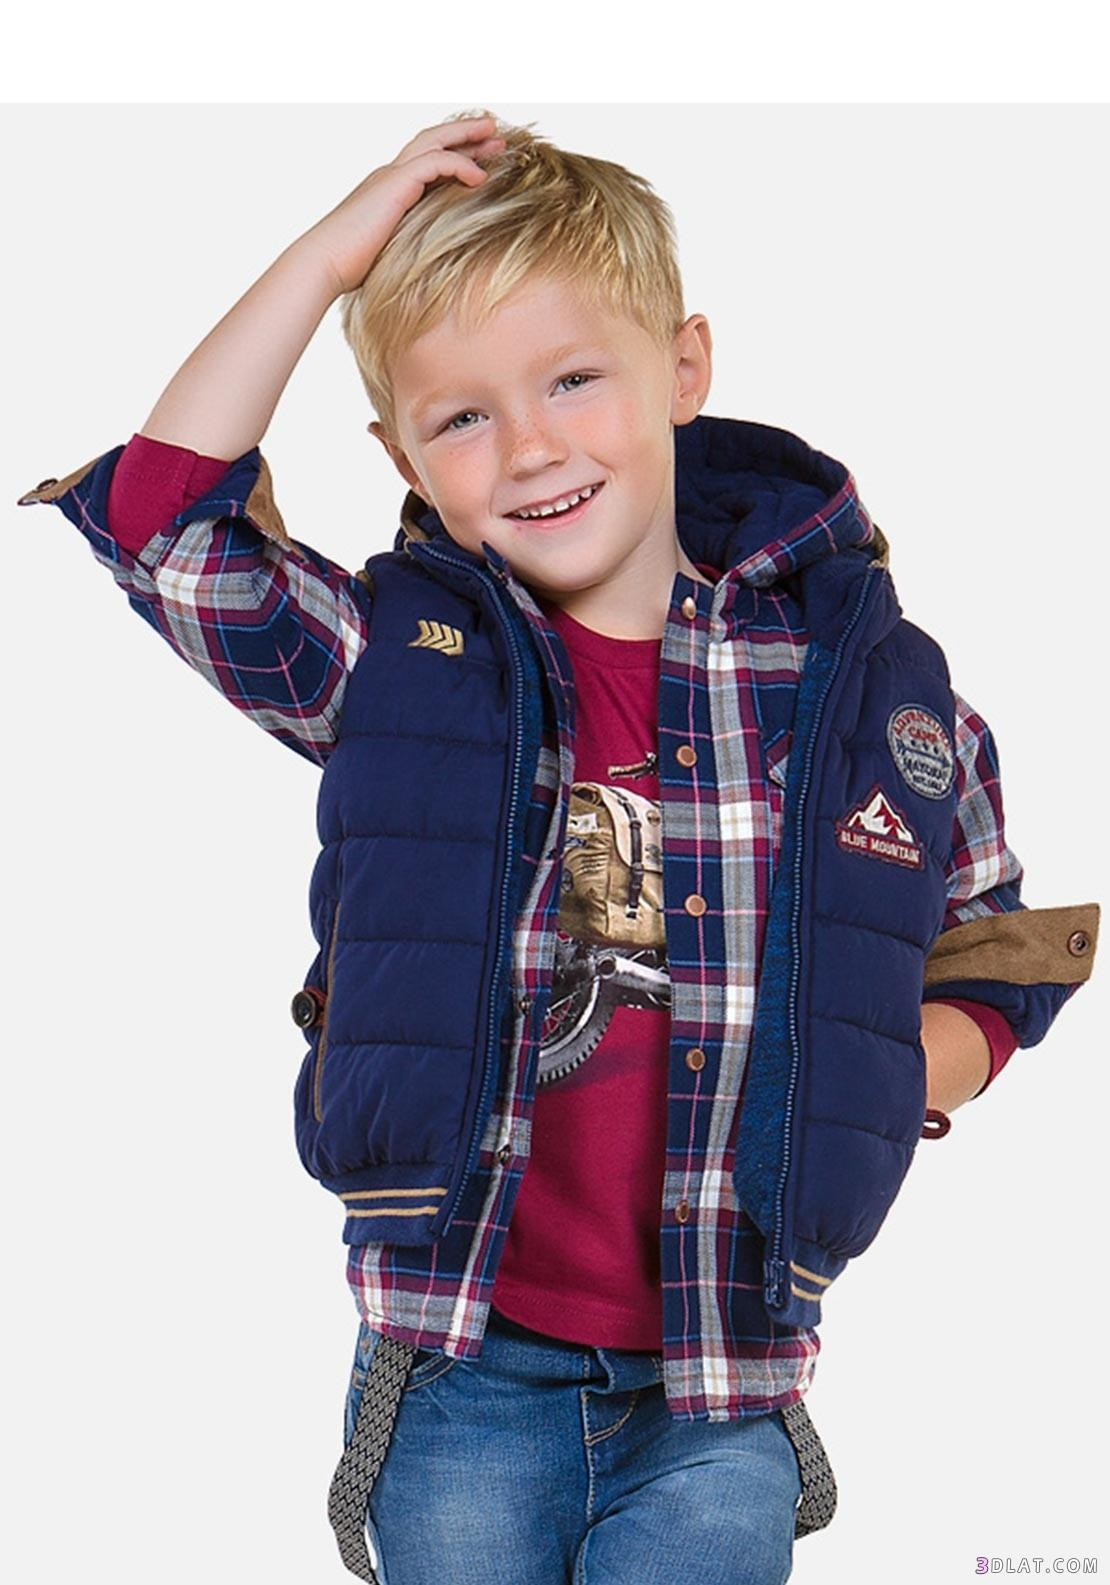 2d3786529 أرقى ملابس أطفال أولاد شتاء 2020 , أجمل ملابس أطفال أولاد , ملابس ...